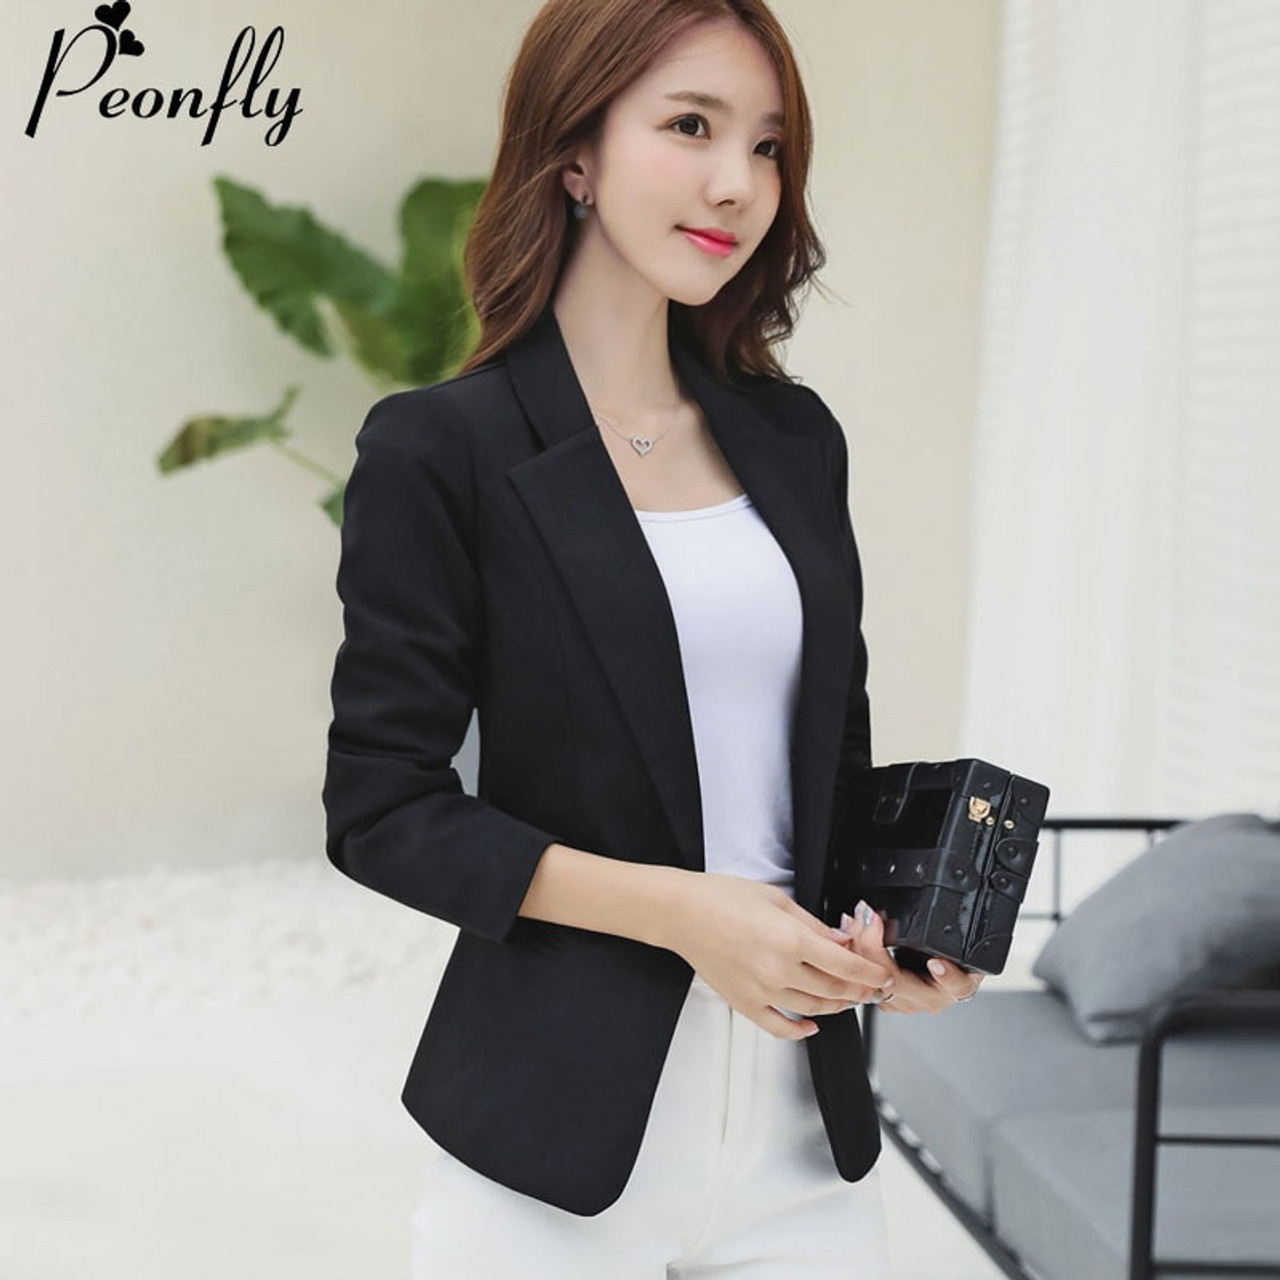 51ad951d9560 PEONFLY Ladies Blazer 2018 Long Sleeve Blaser Women Suit jacket Female  Feminine Blazer Femme Black Blazer ...